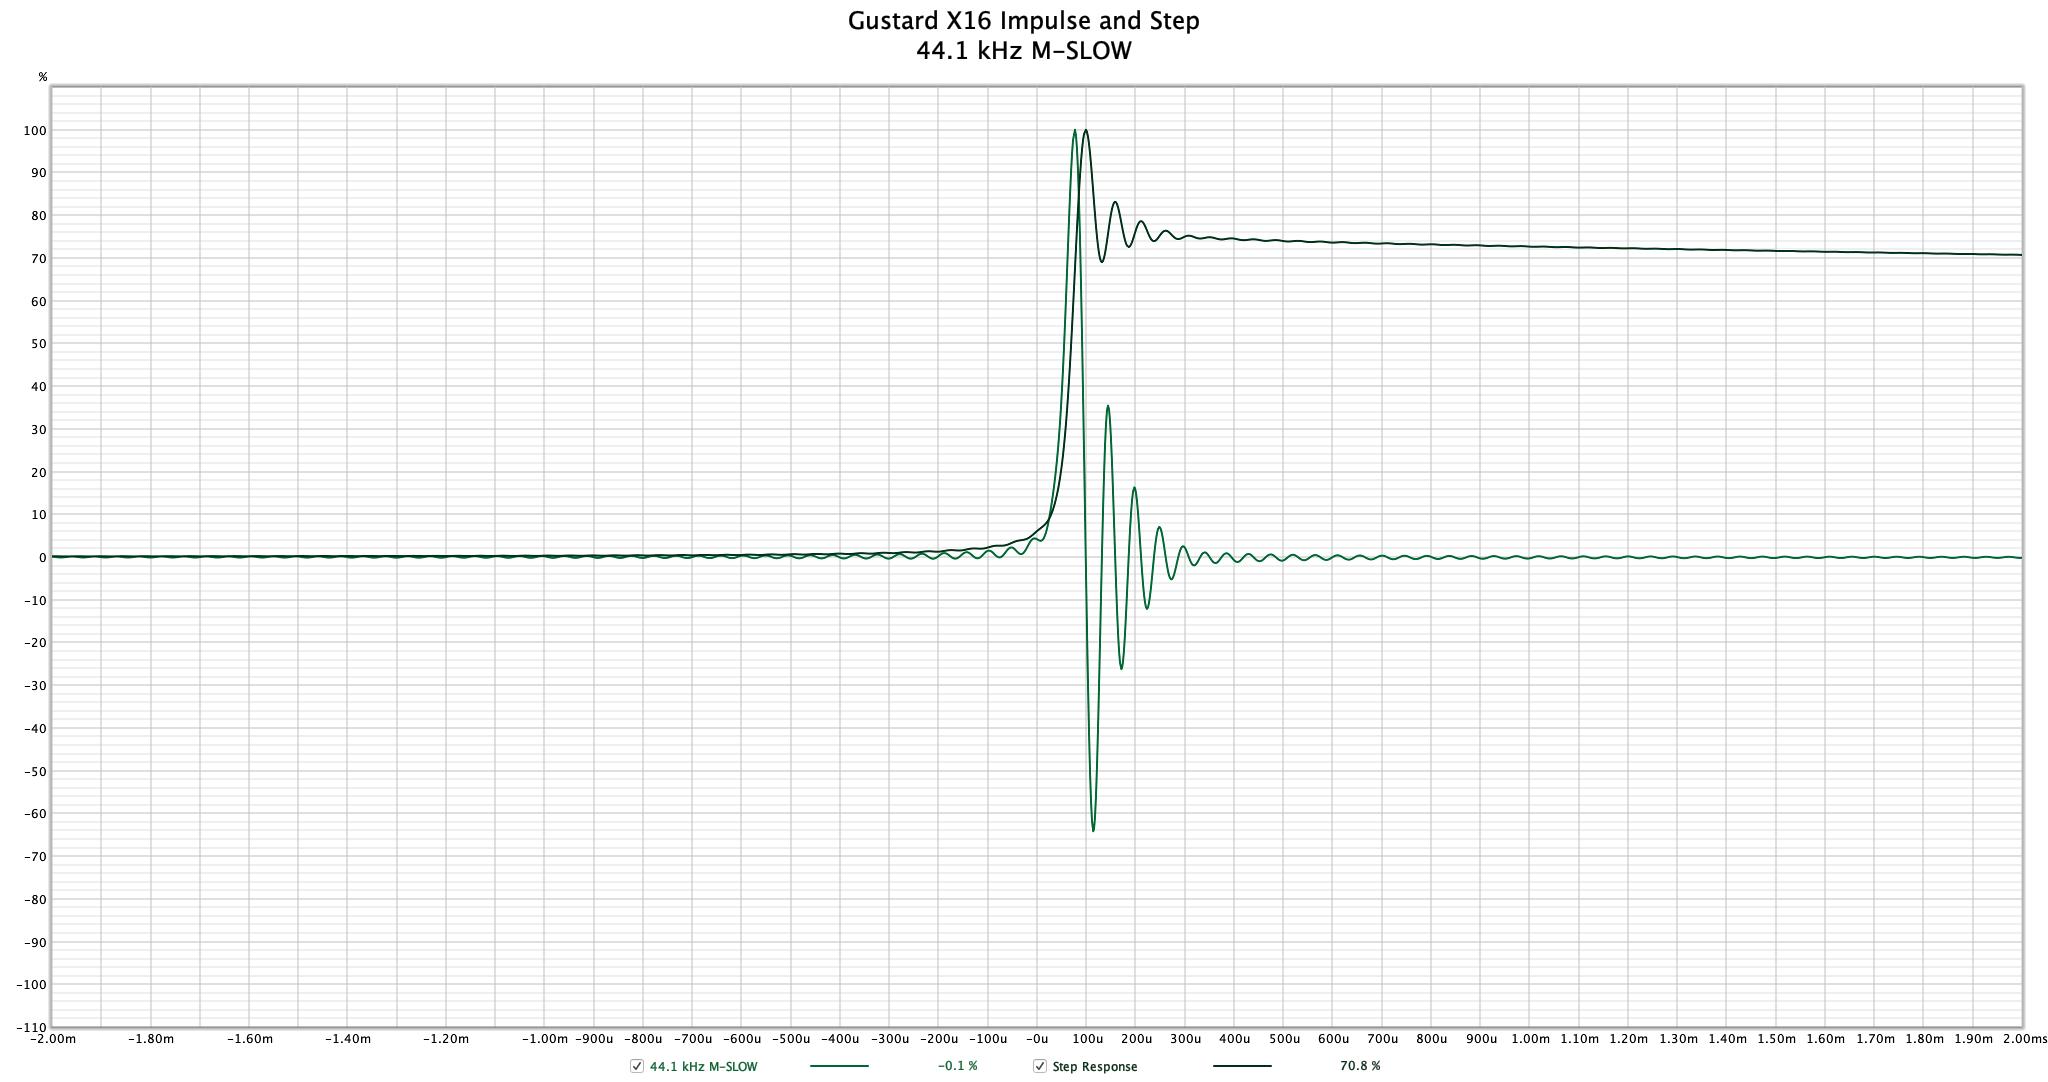 Gustard X16 - 44.1 kHz M-SLOW Impulse.png